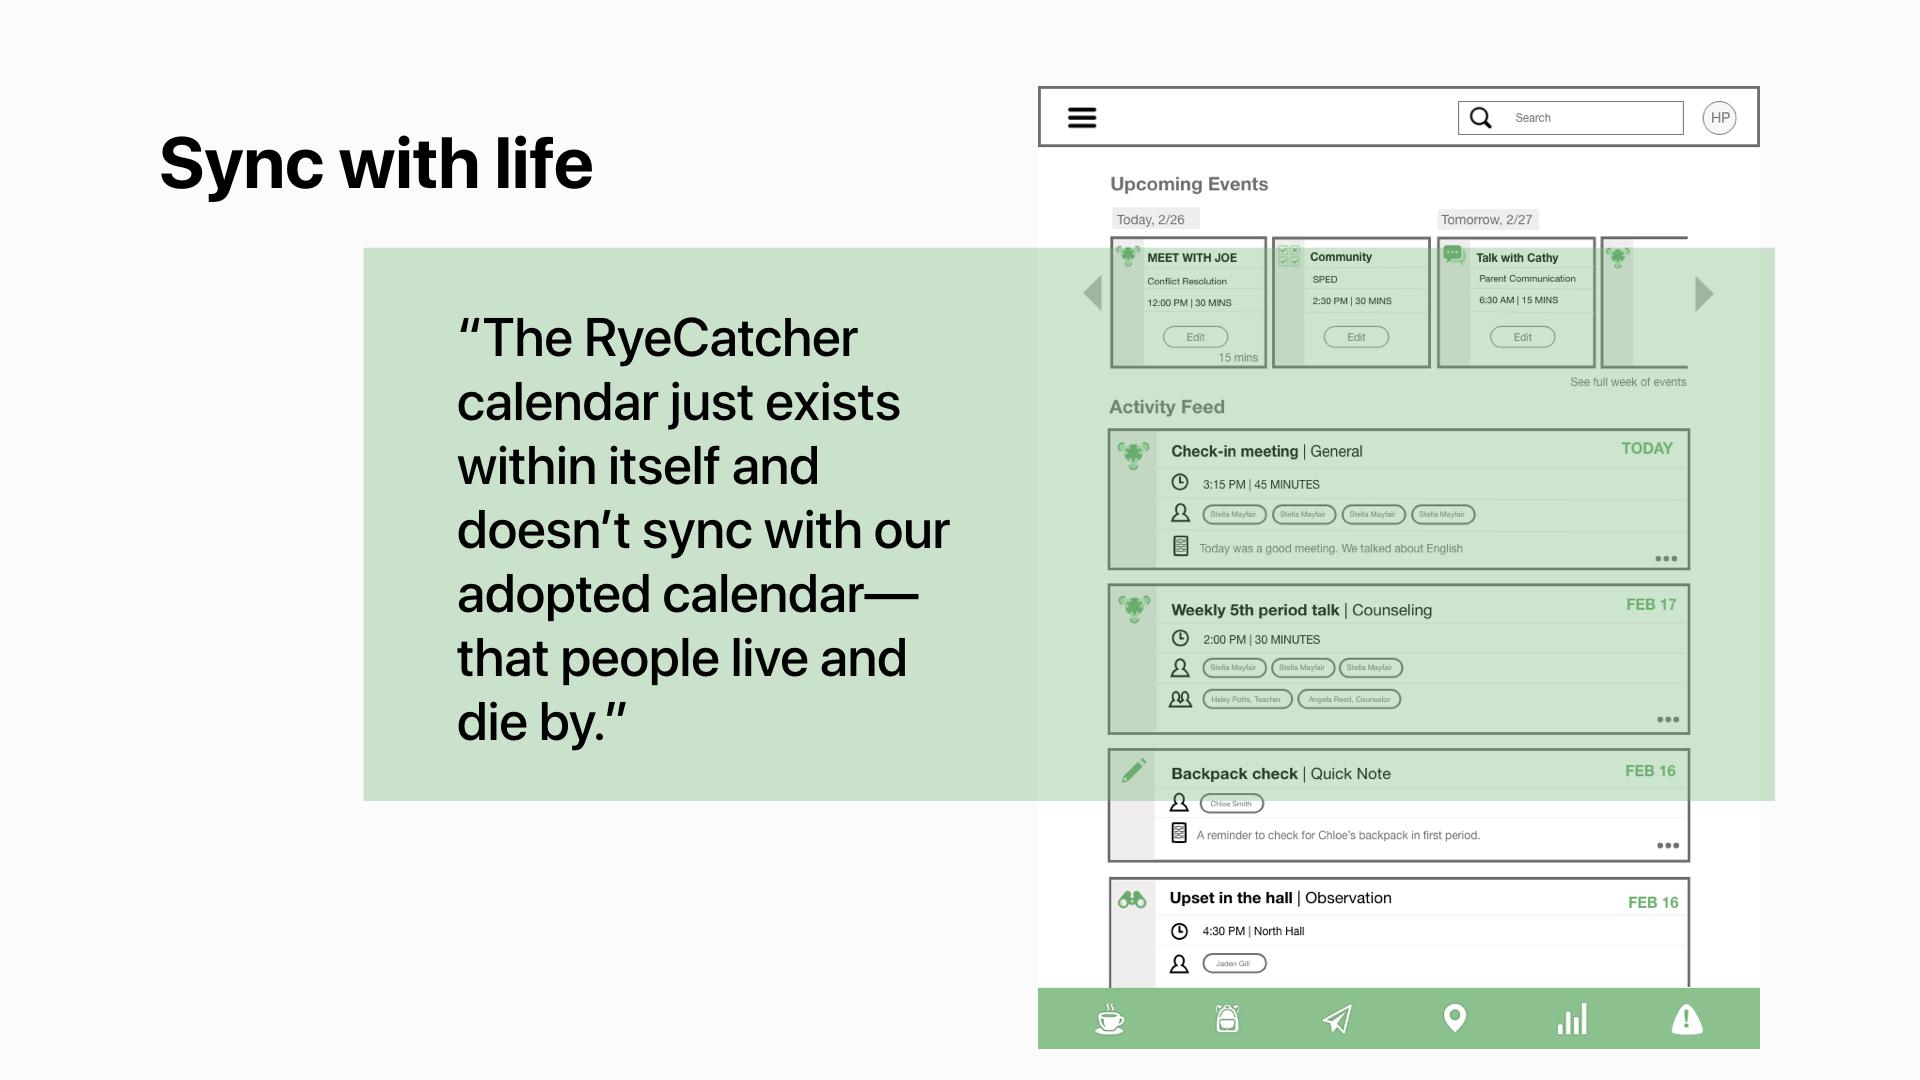 RyeCatcher-EvaluativeResearch (8).001.jpeg